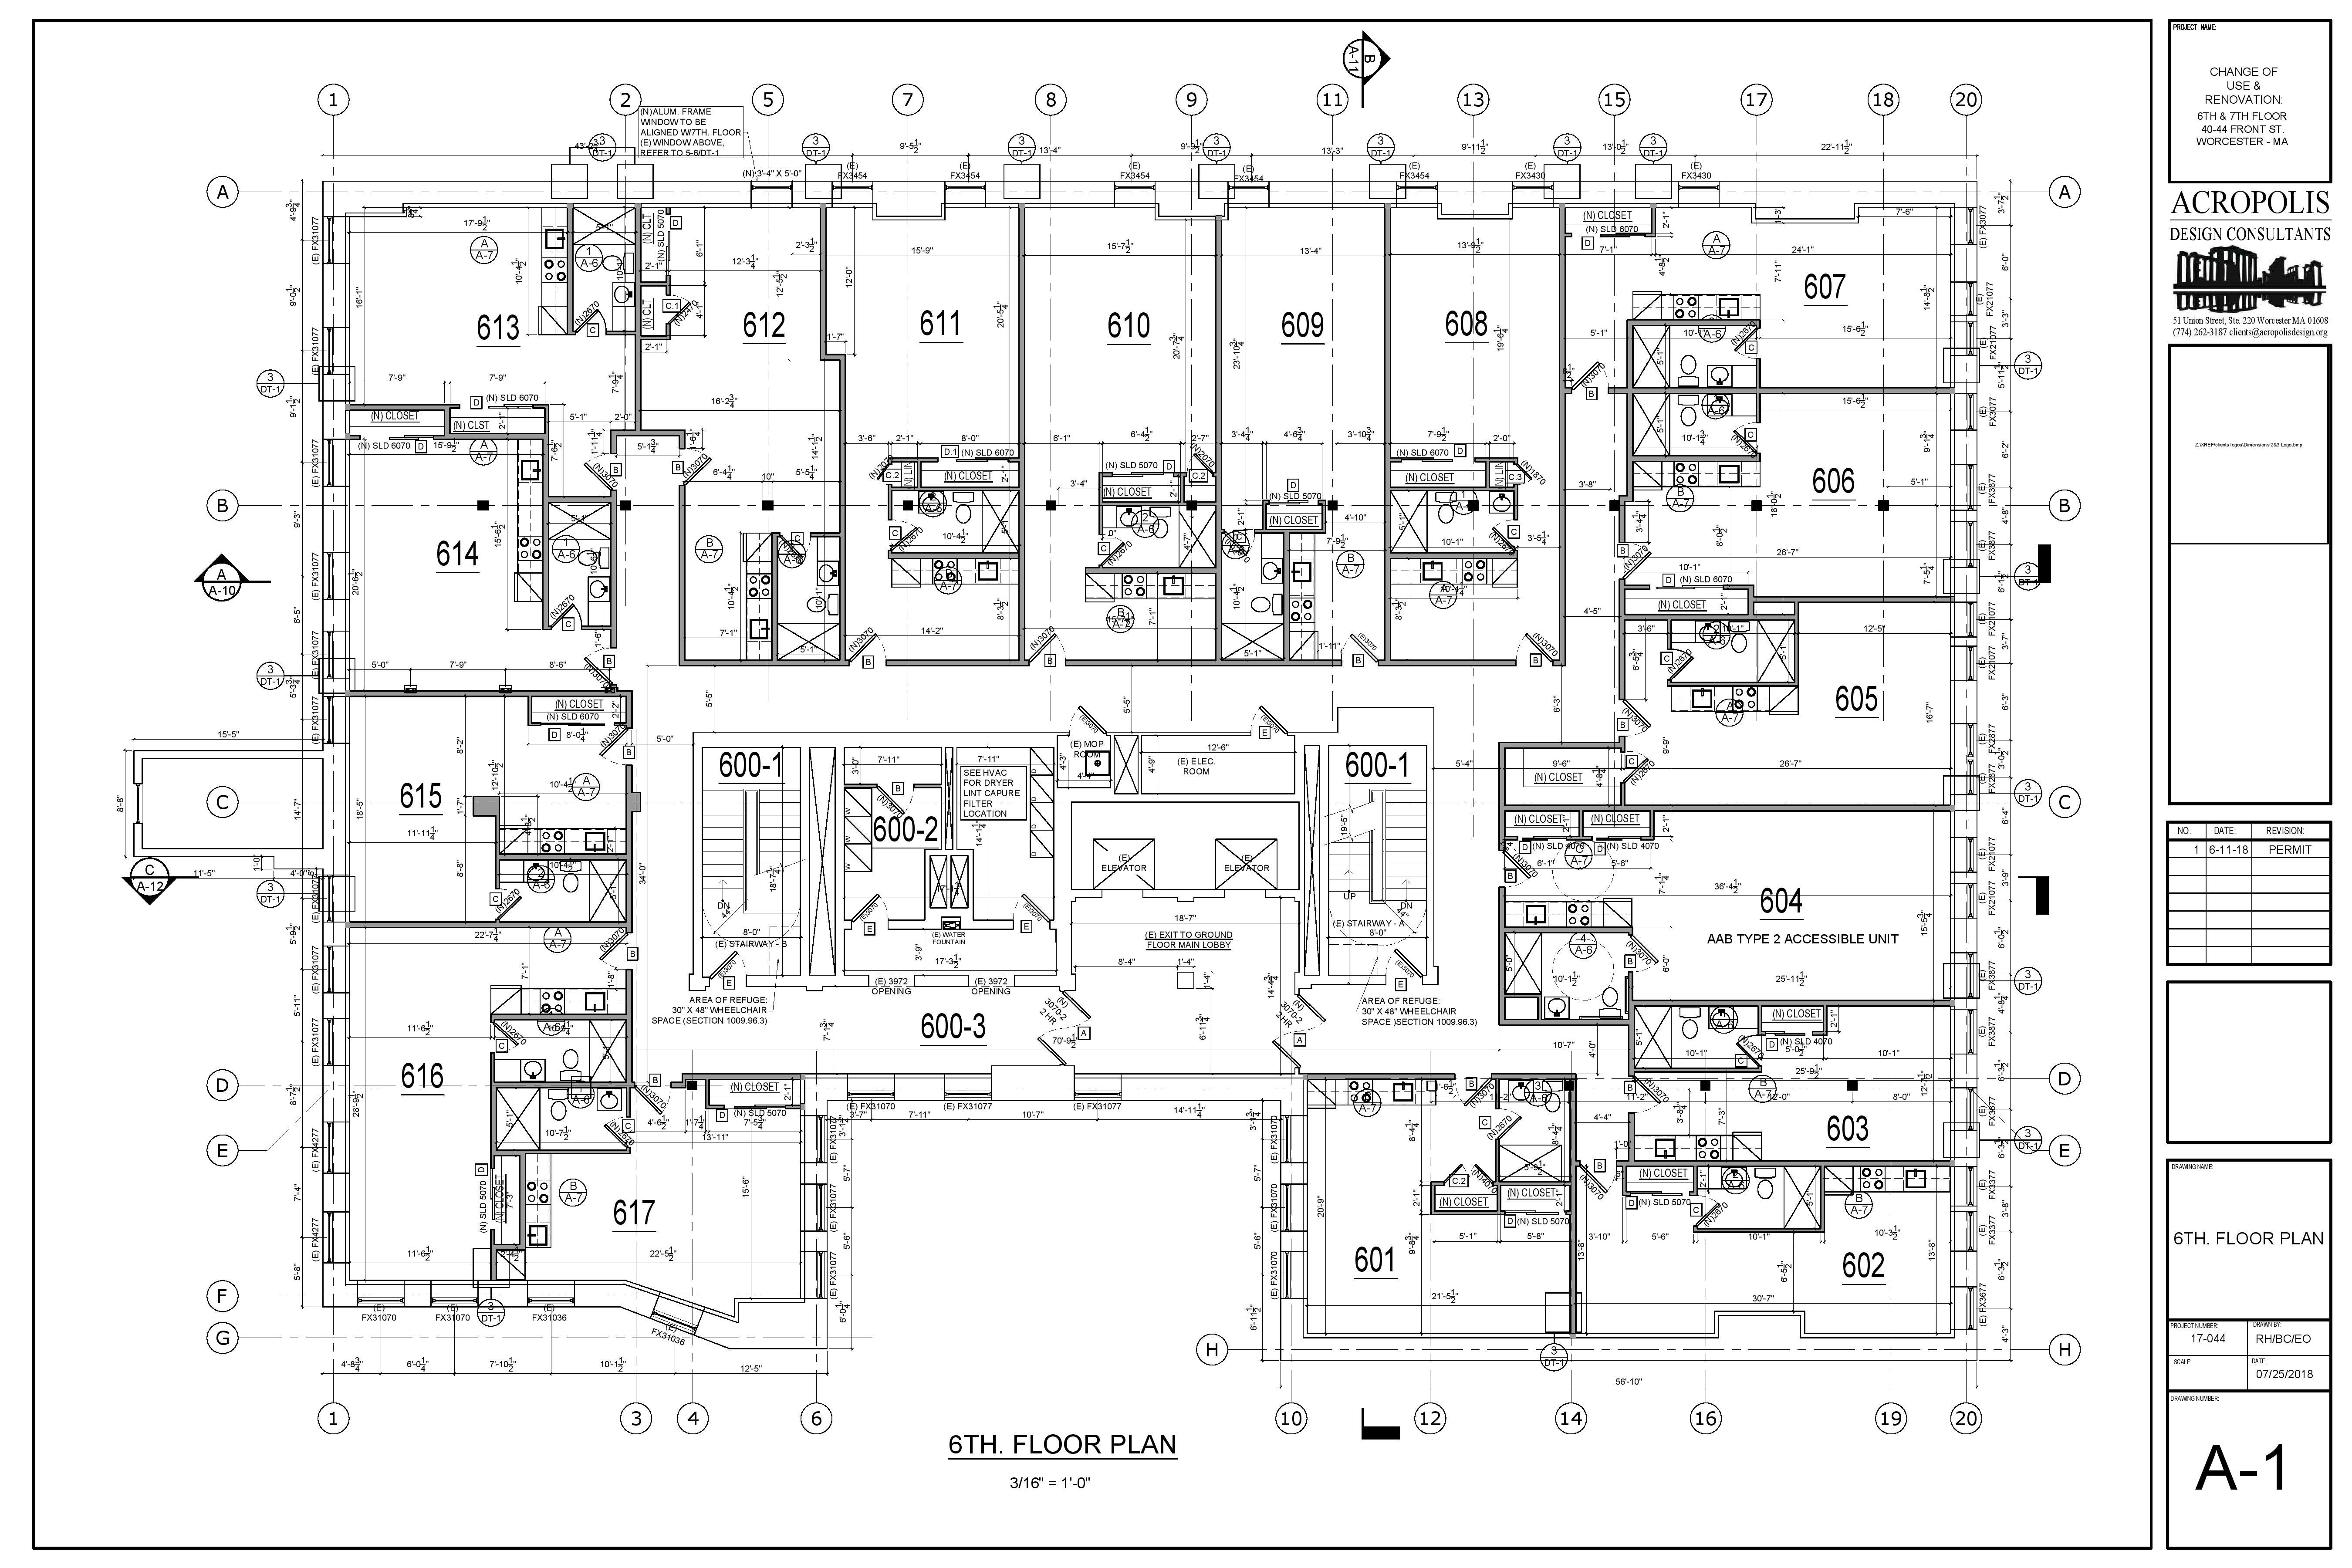 Proposed Floor plans